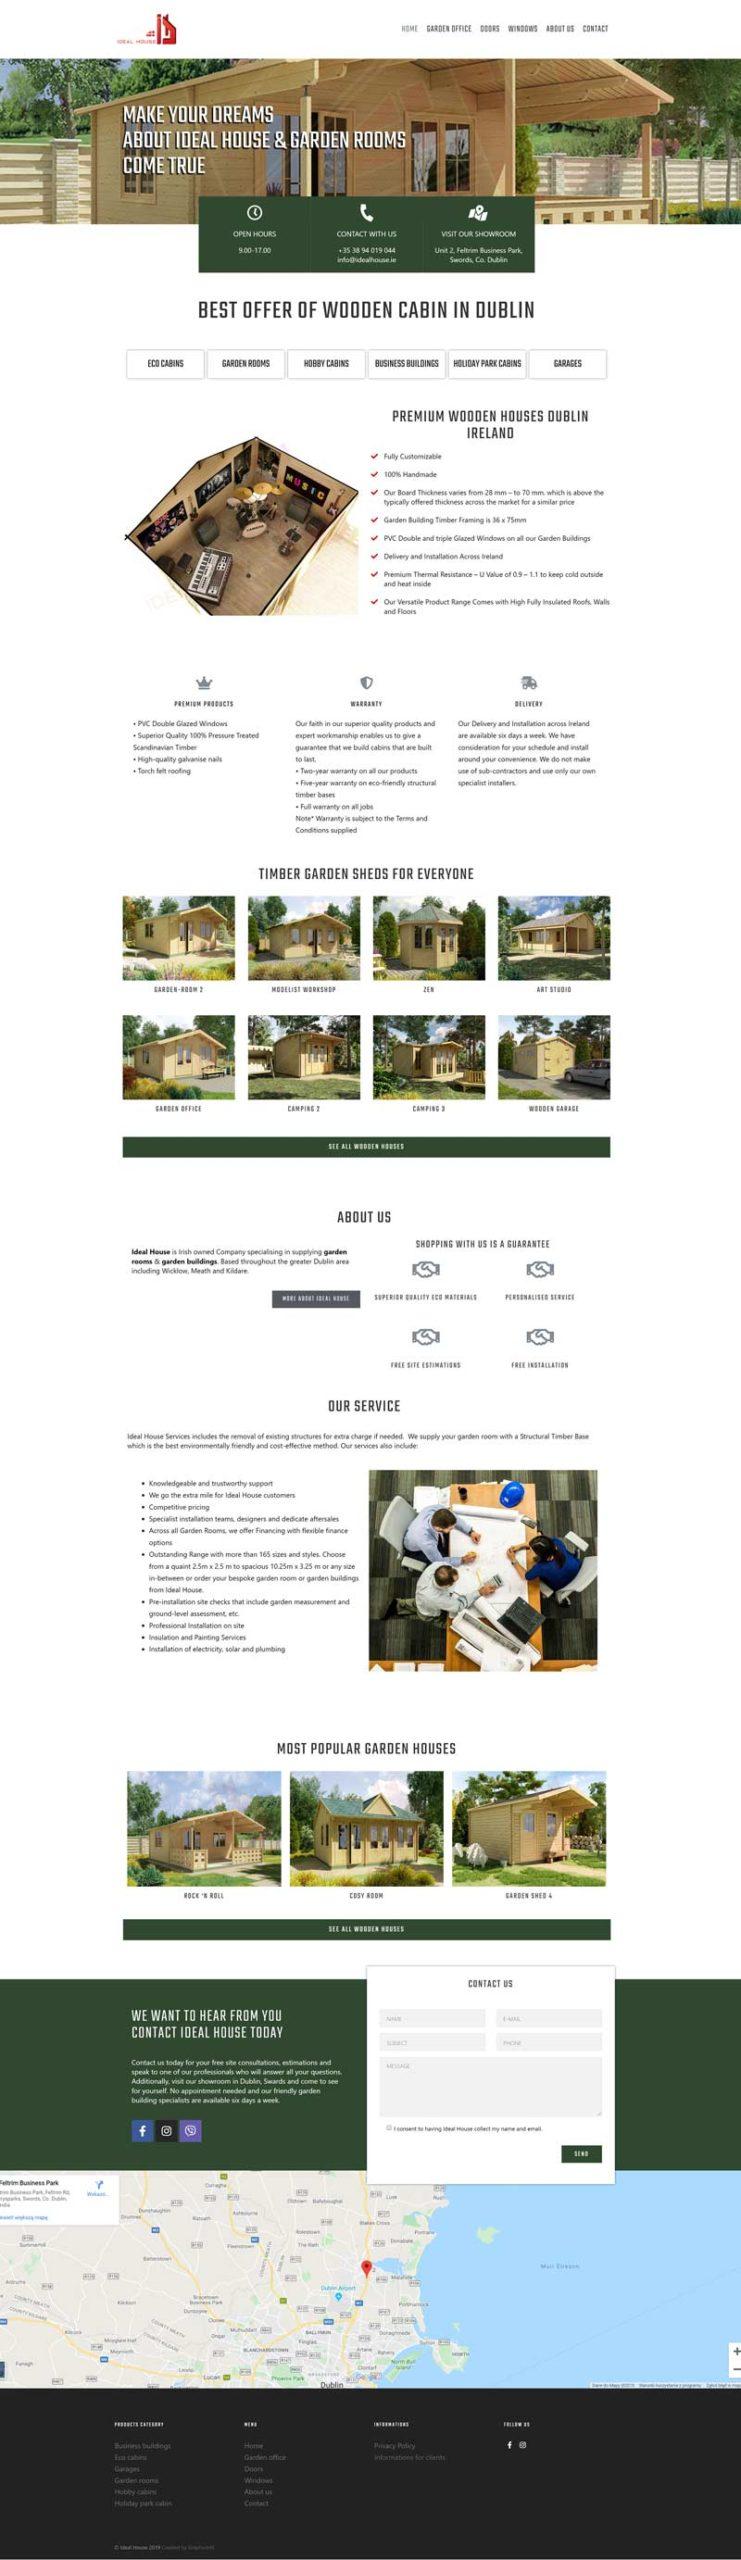 ideal-house-strona-internetowa-.jpg